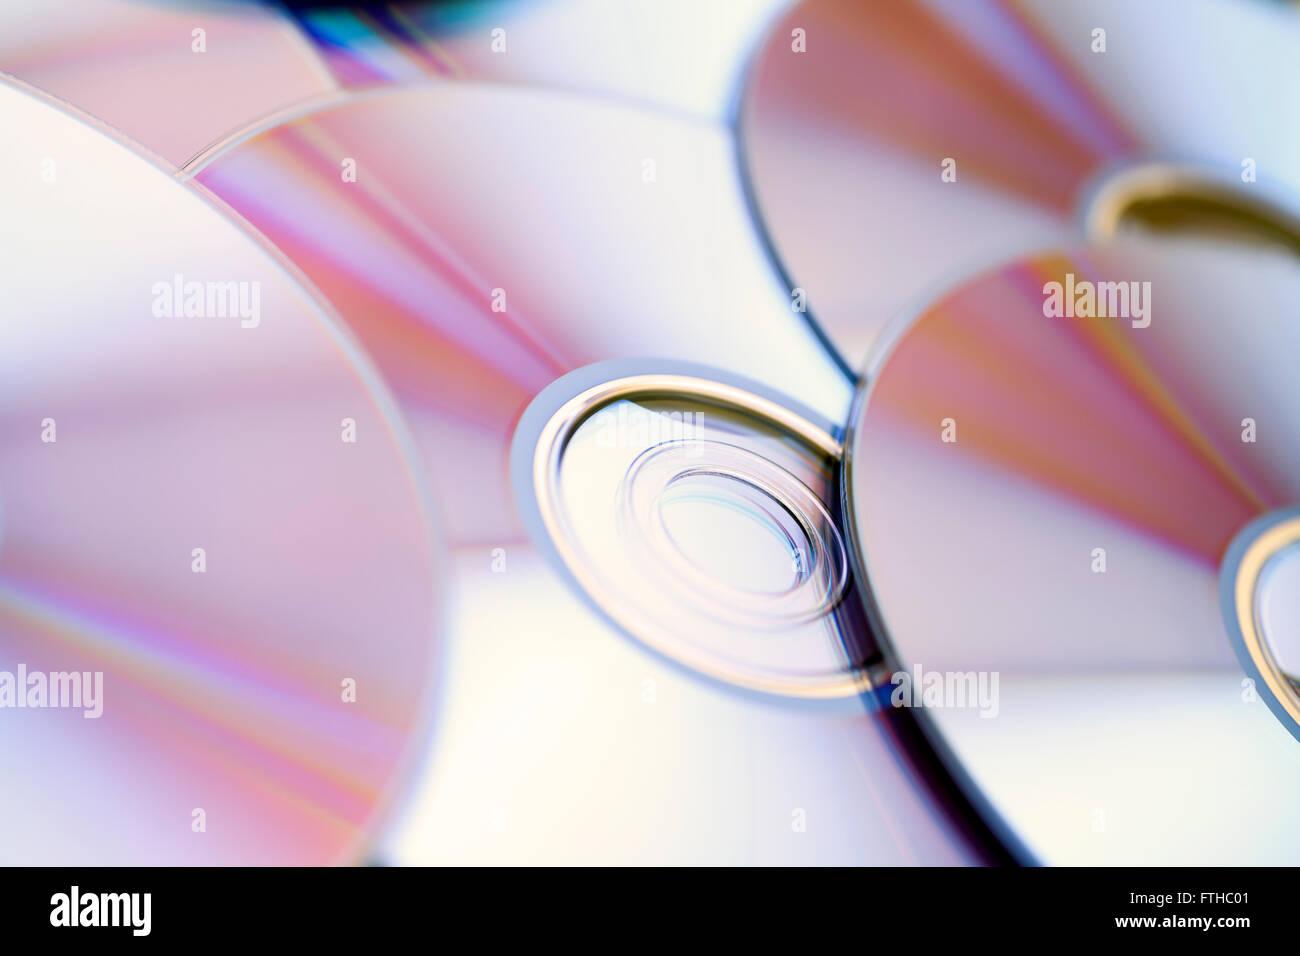 DVD Disks background. Close up. - Stock Image